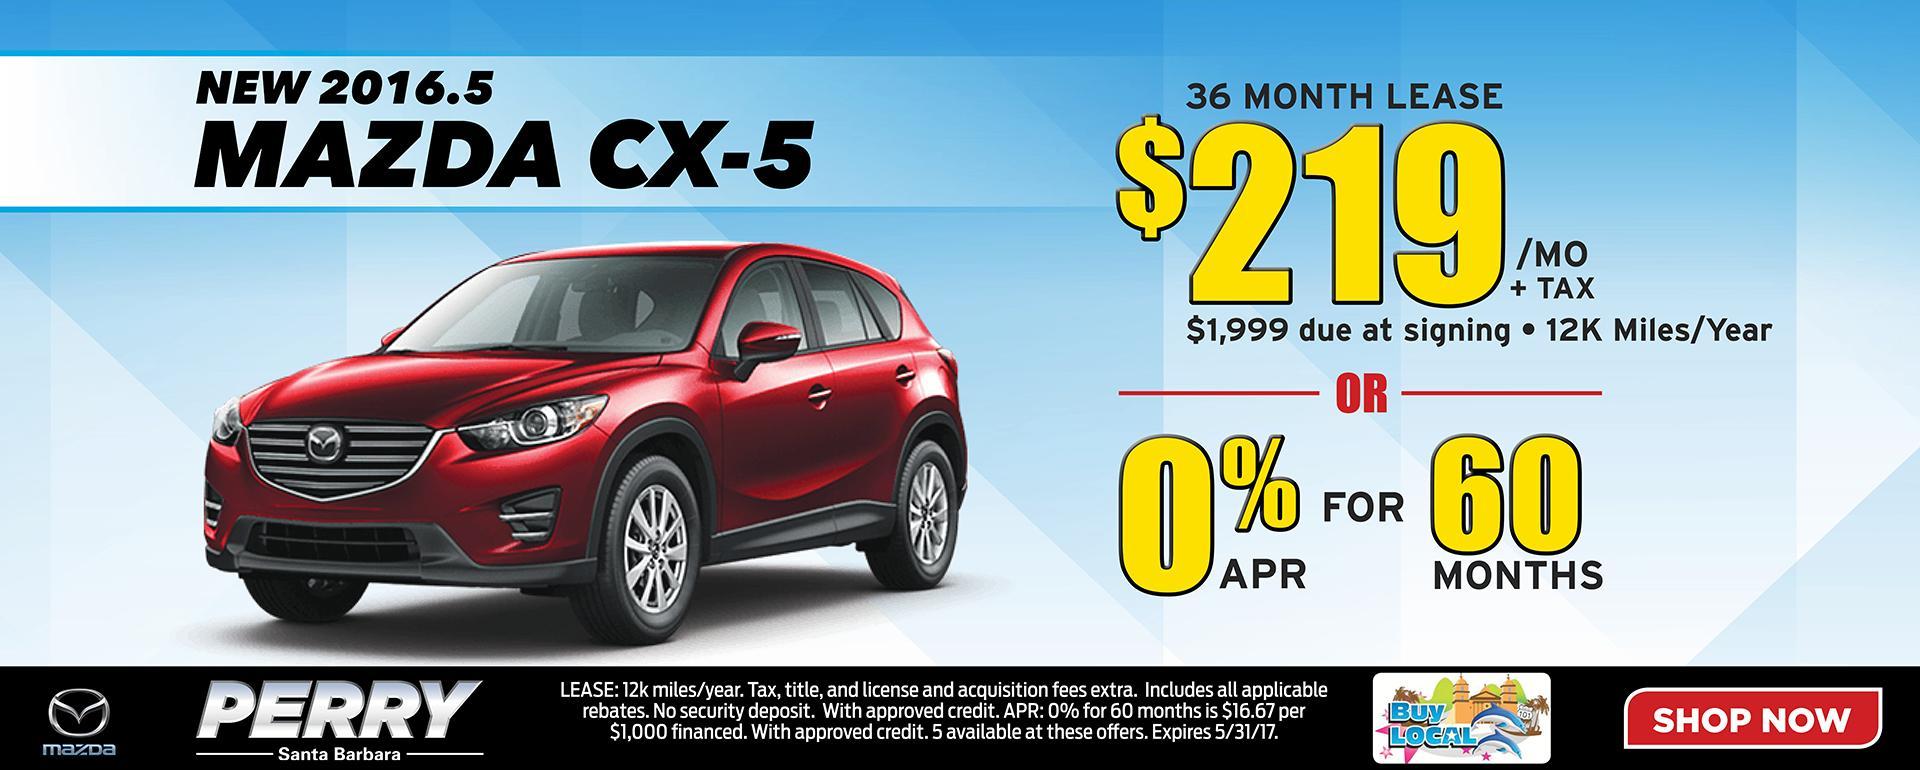 New Mazda CX-5 Special